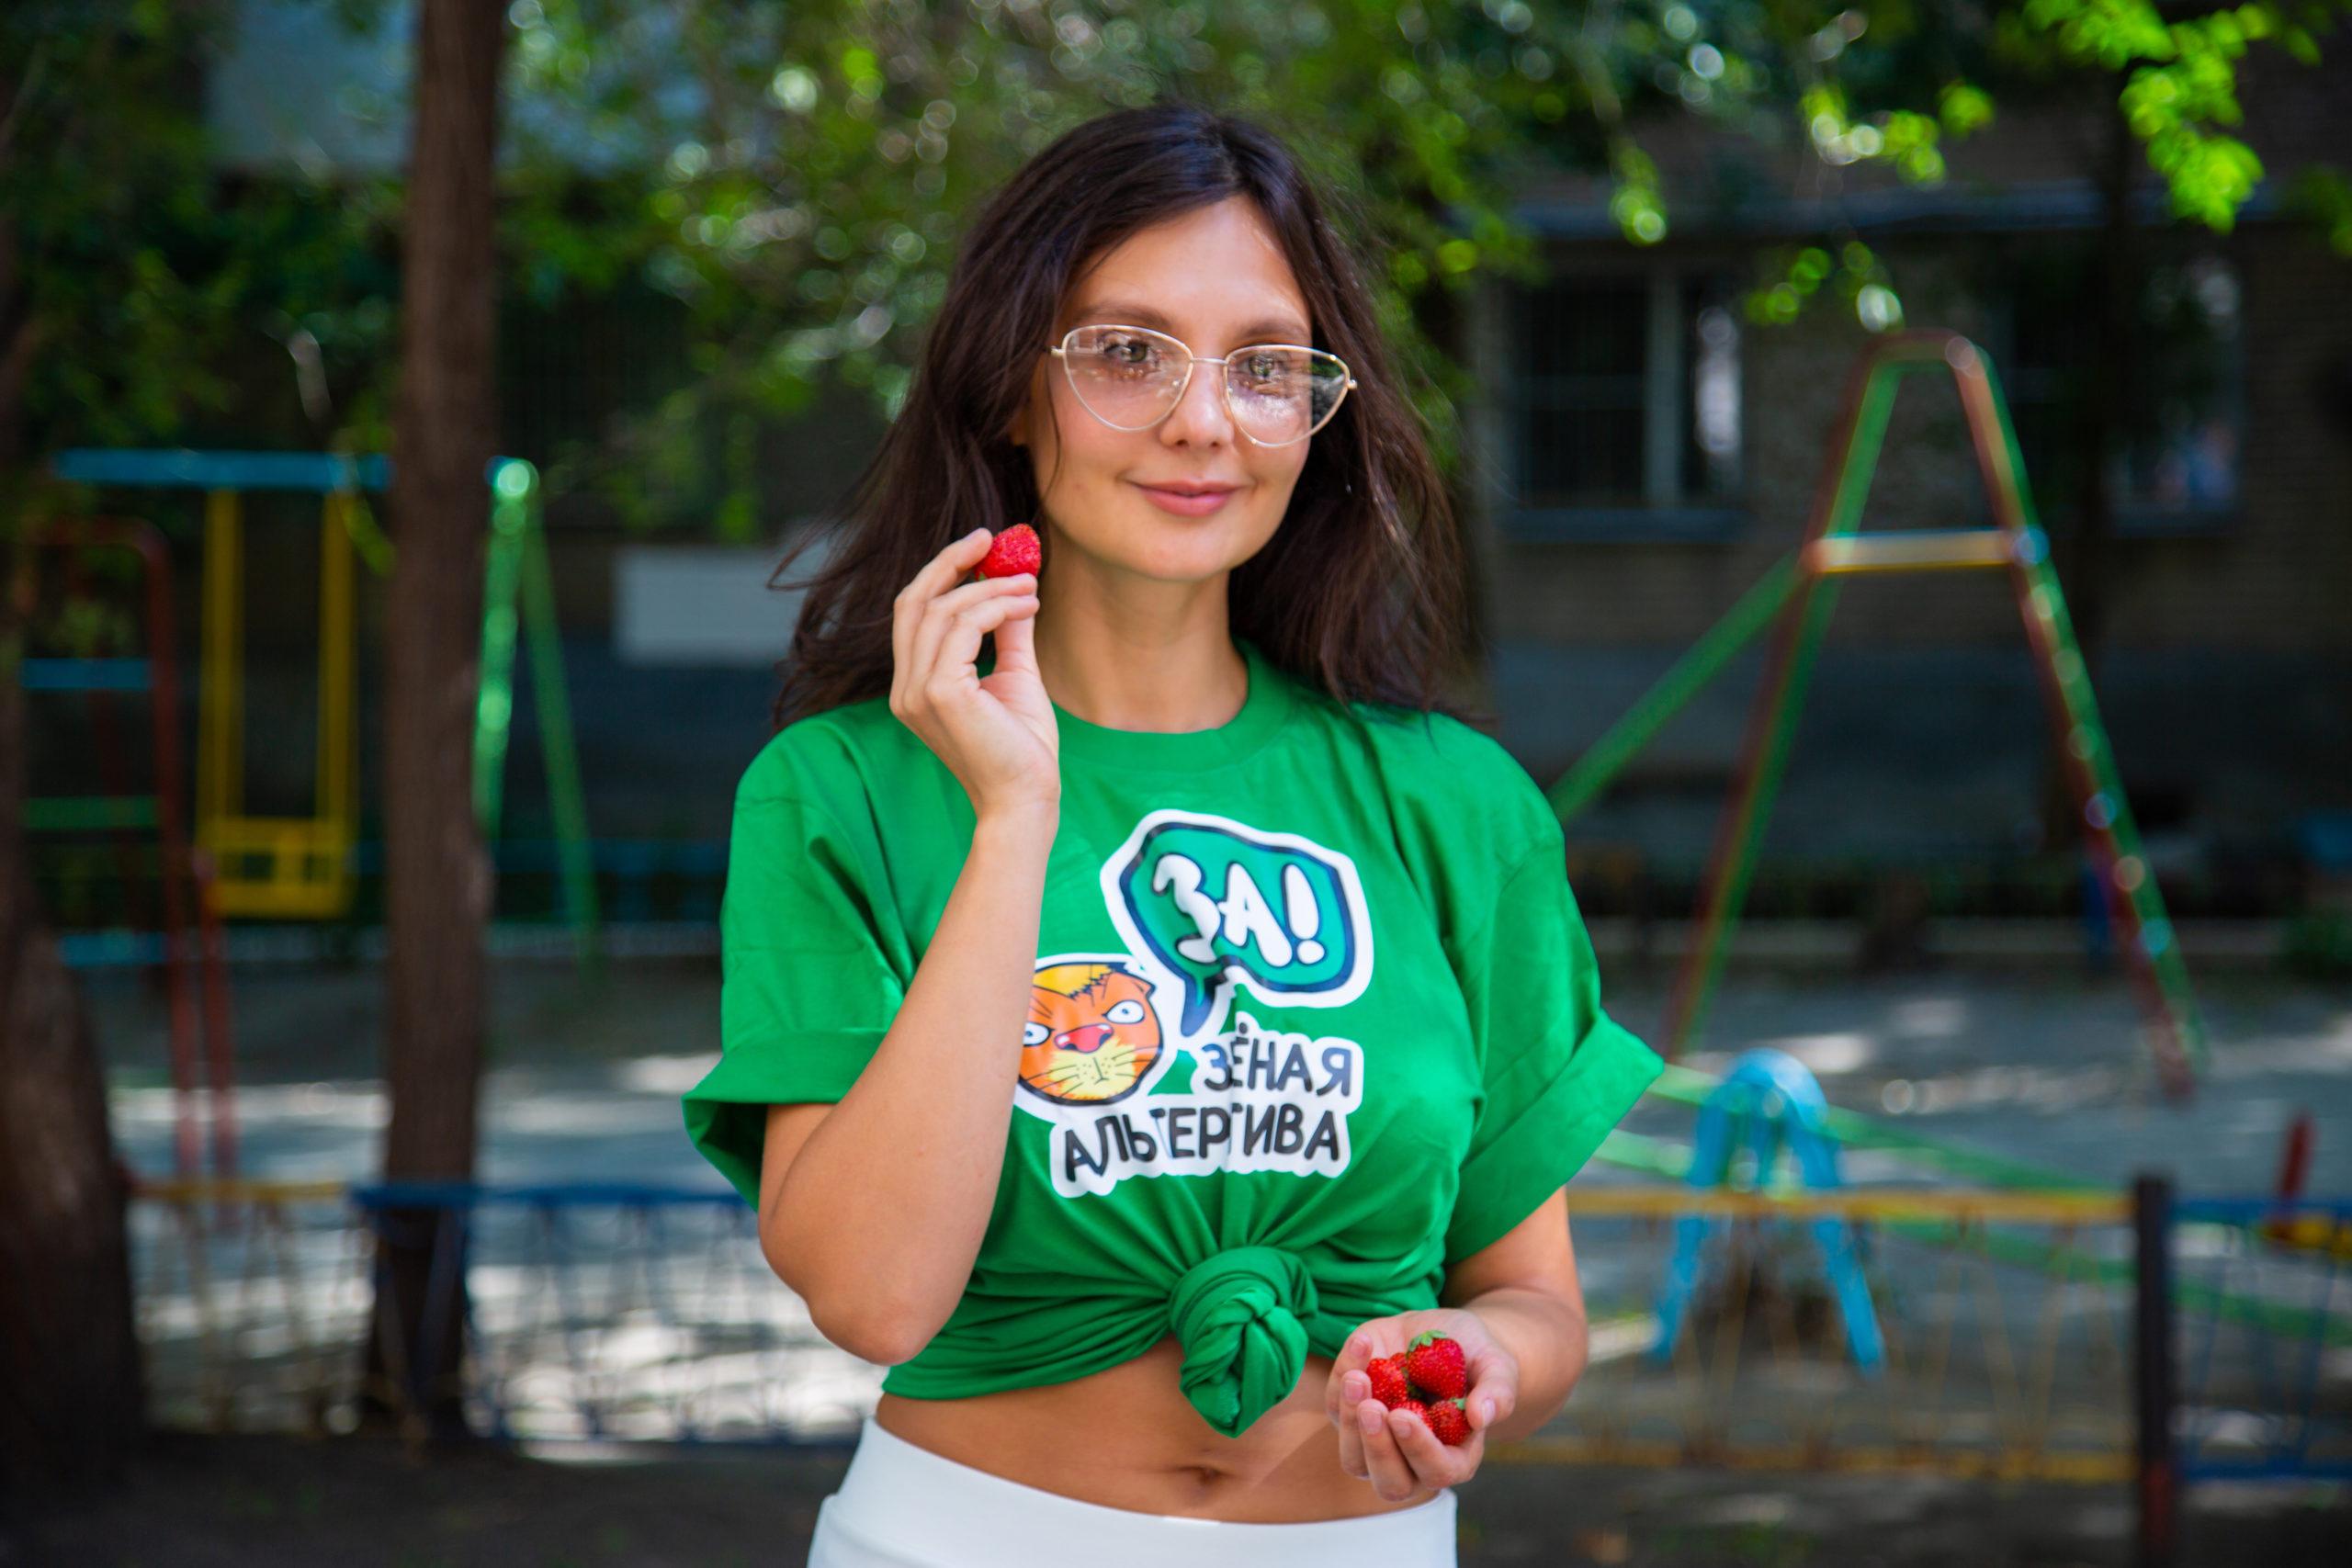 Софья Гудим дала старт флешмобу #витаминысгрядки 1